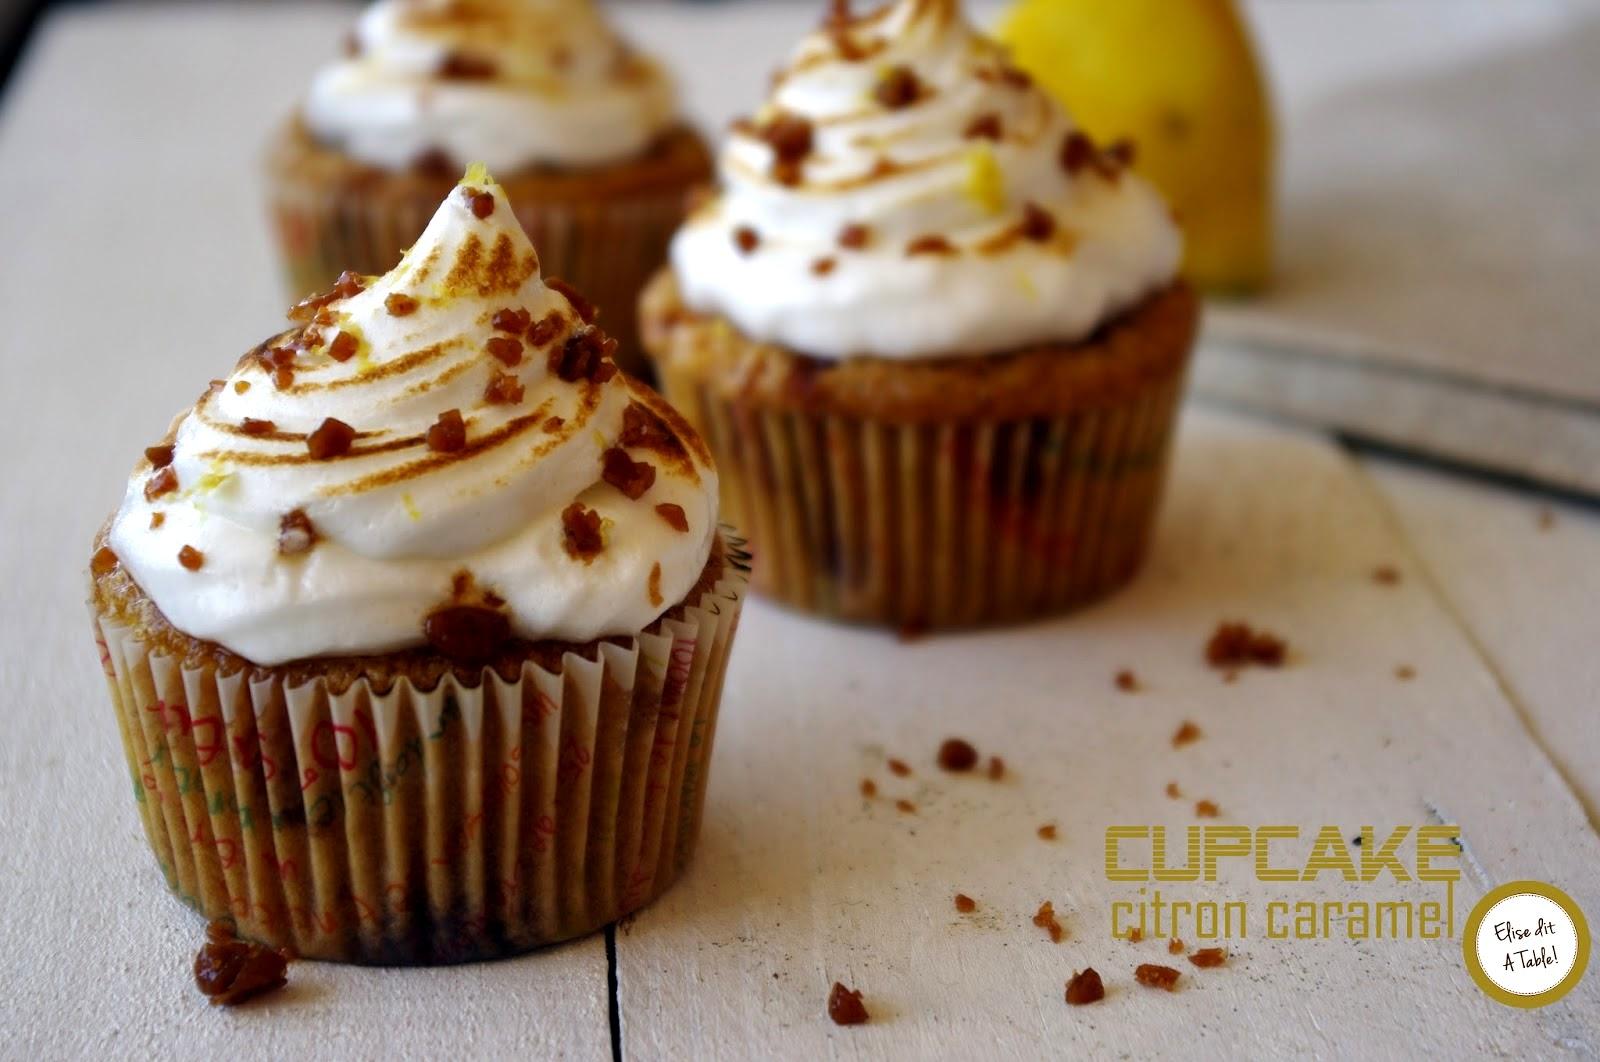 recette Cupcake citron caramel